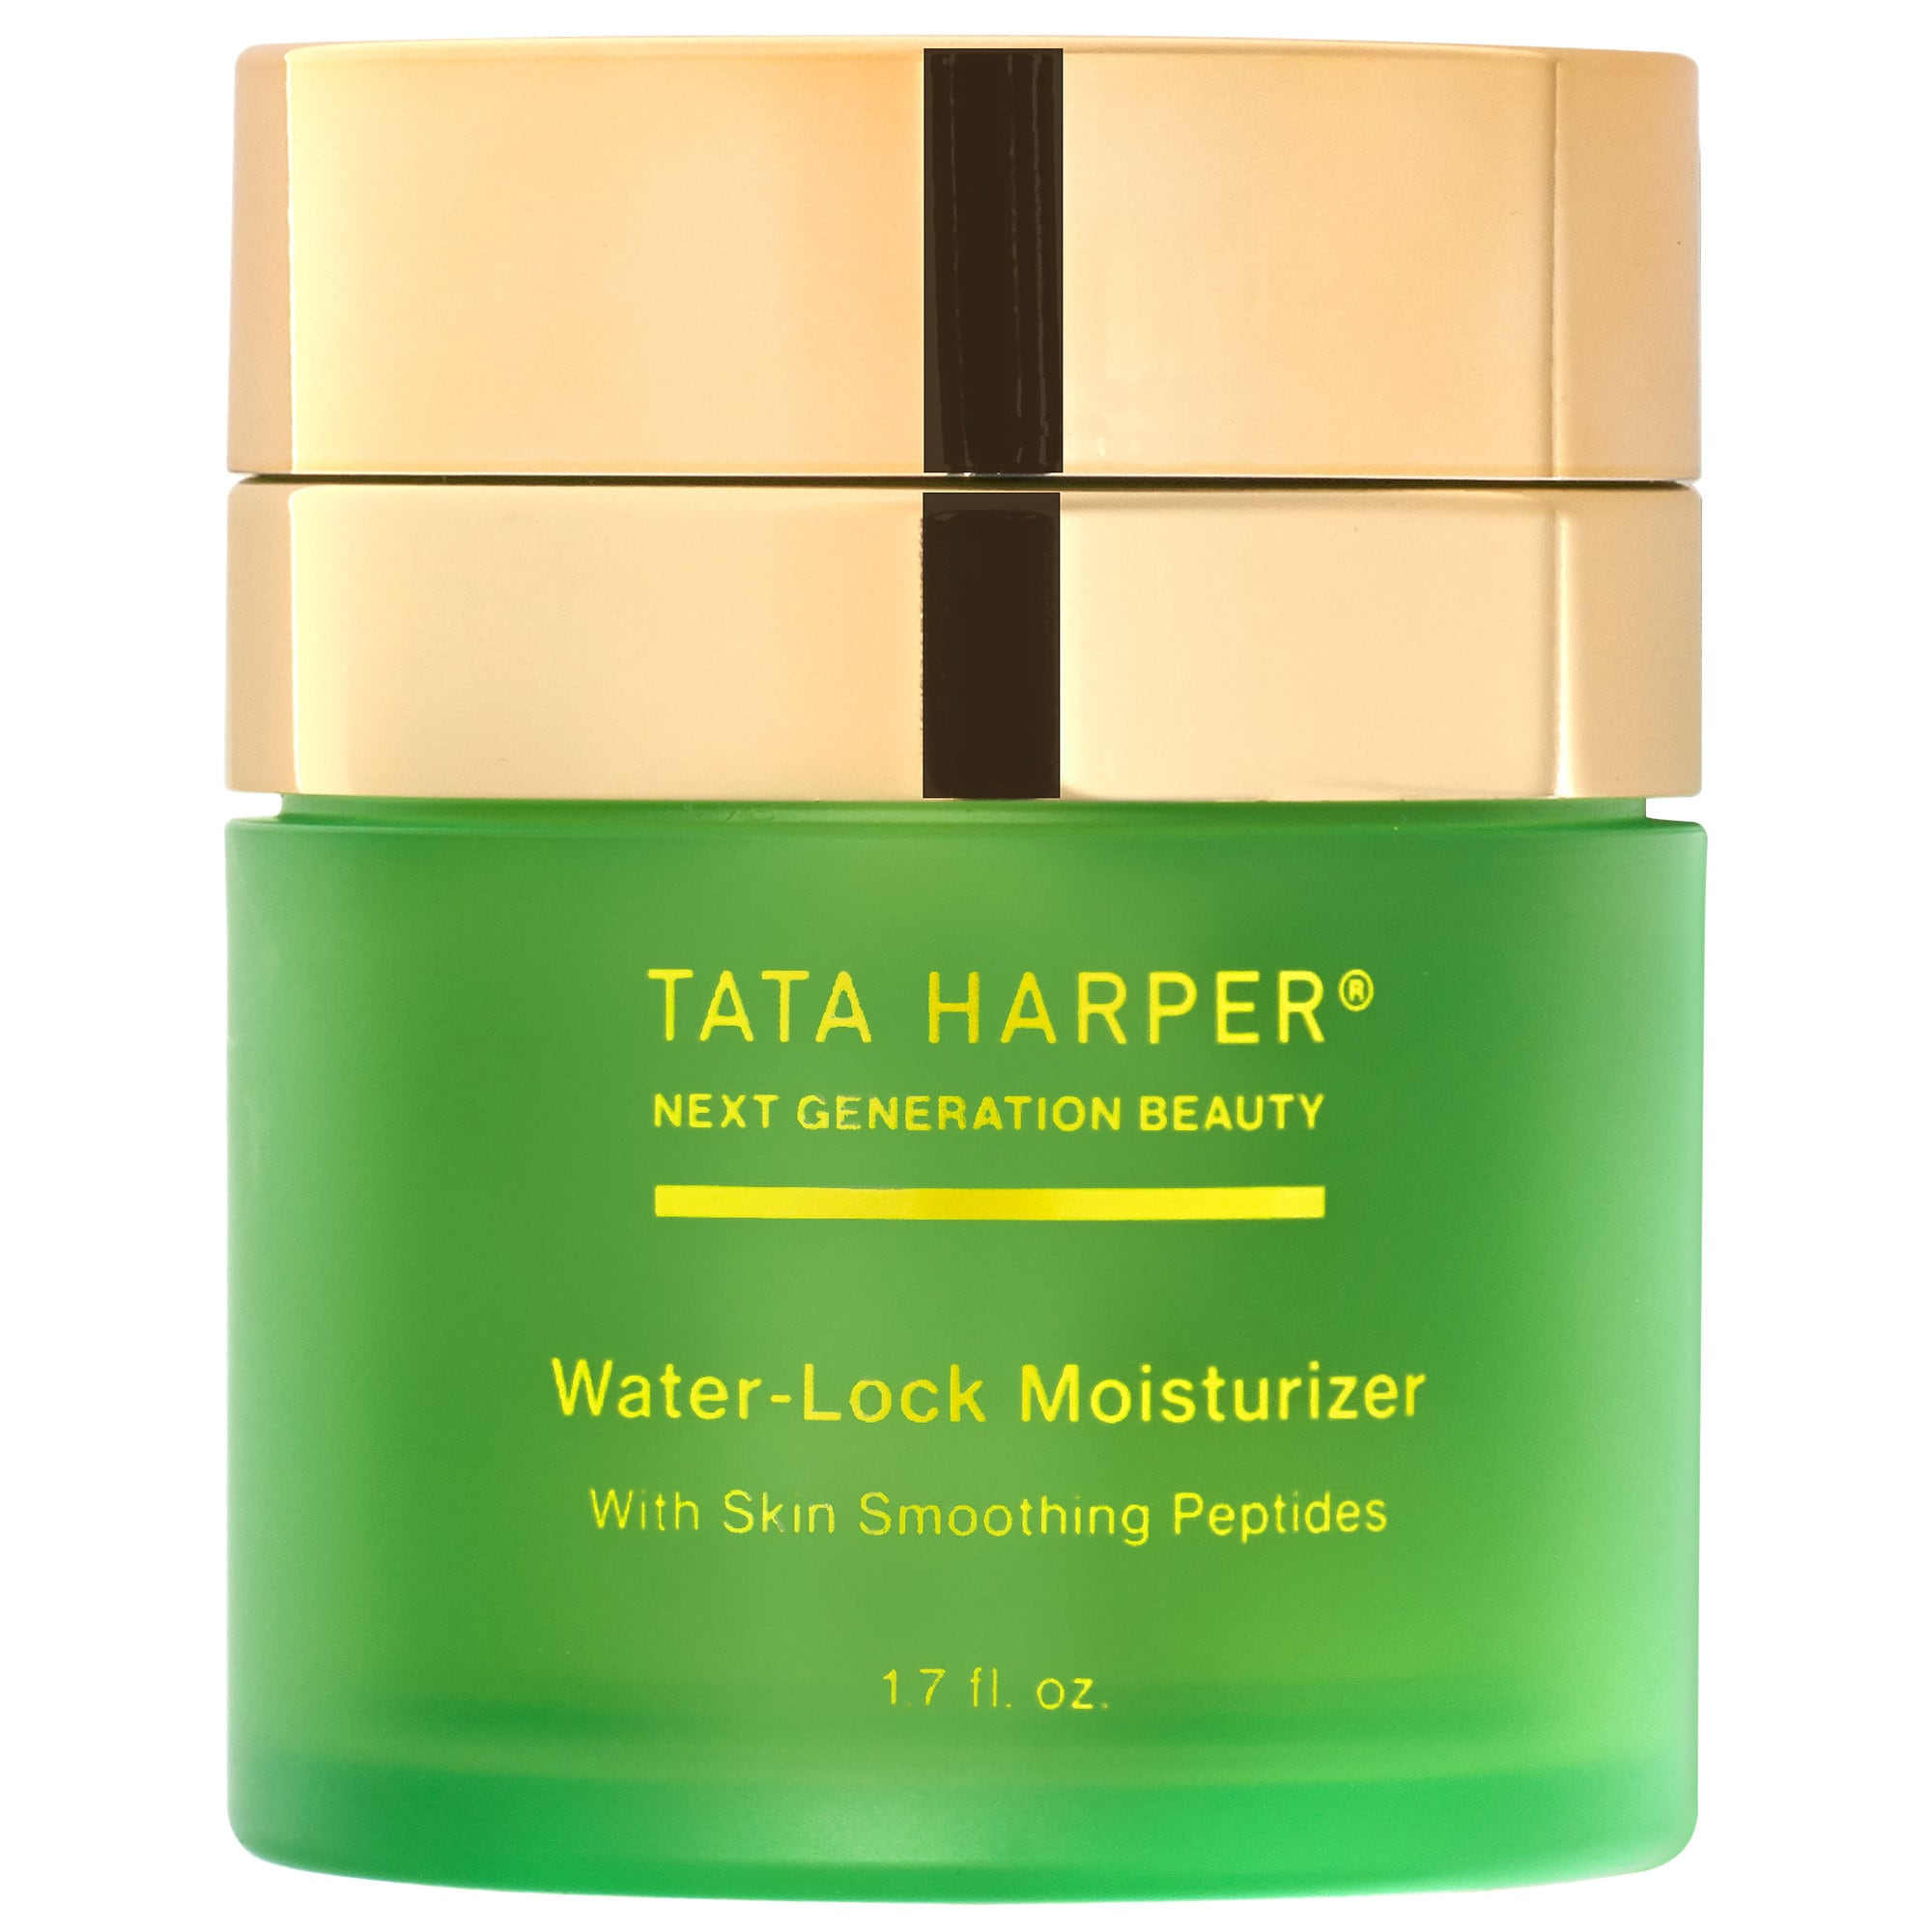 Tata Harper - Water-Lock Moisturizer with Skin-Smoothing Peptides